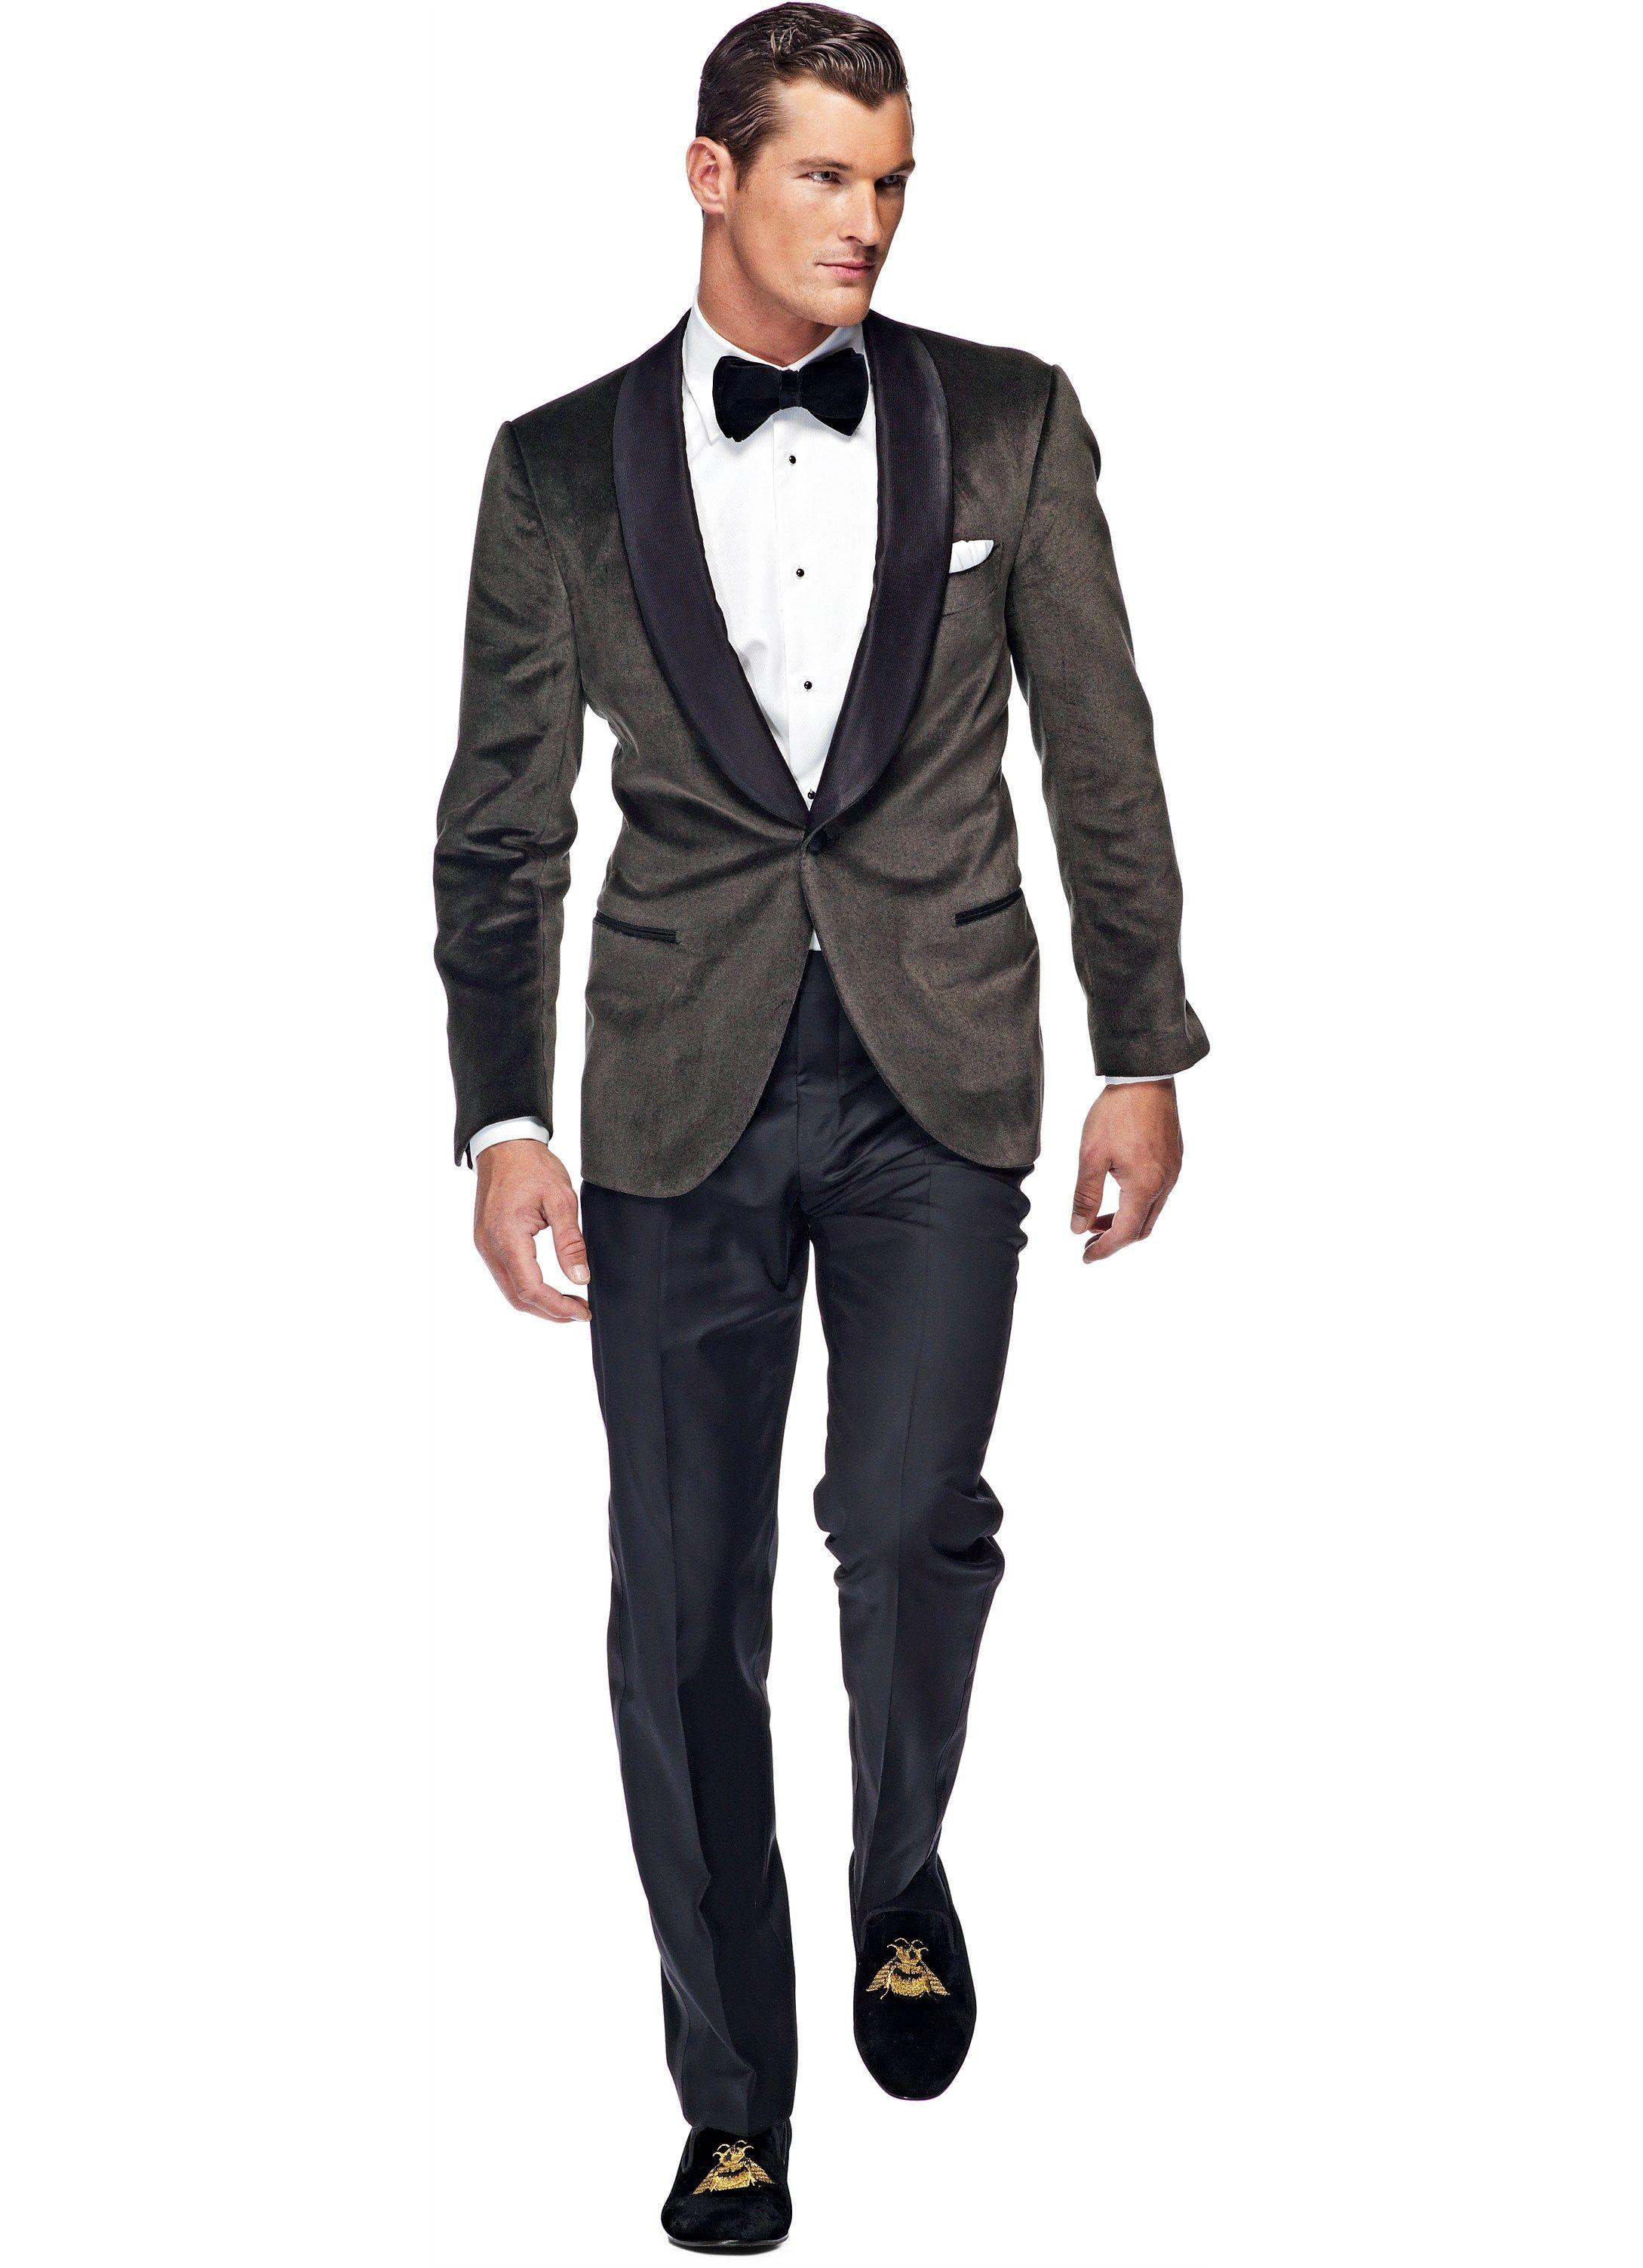 Dinner Jacket Dark Grey Plain (SuitSupply) | My Style | Pinterest ...